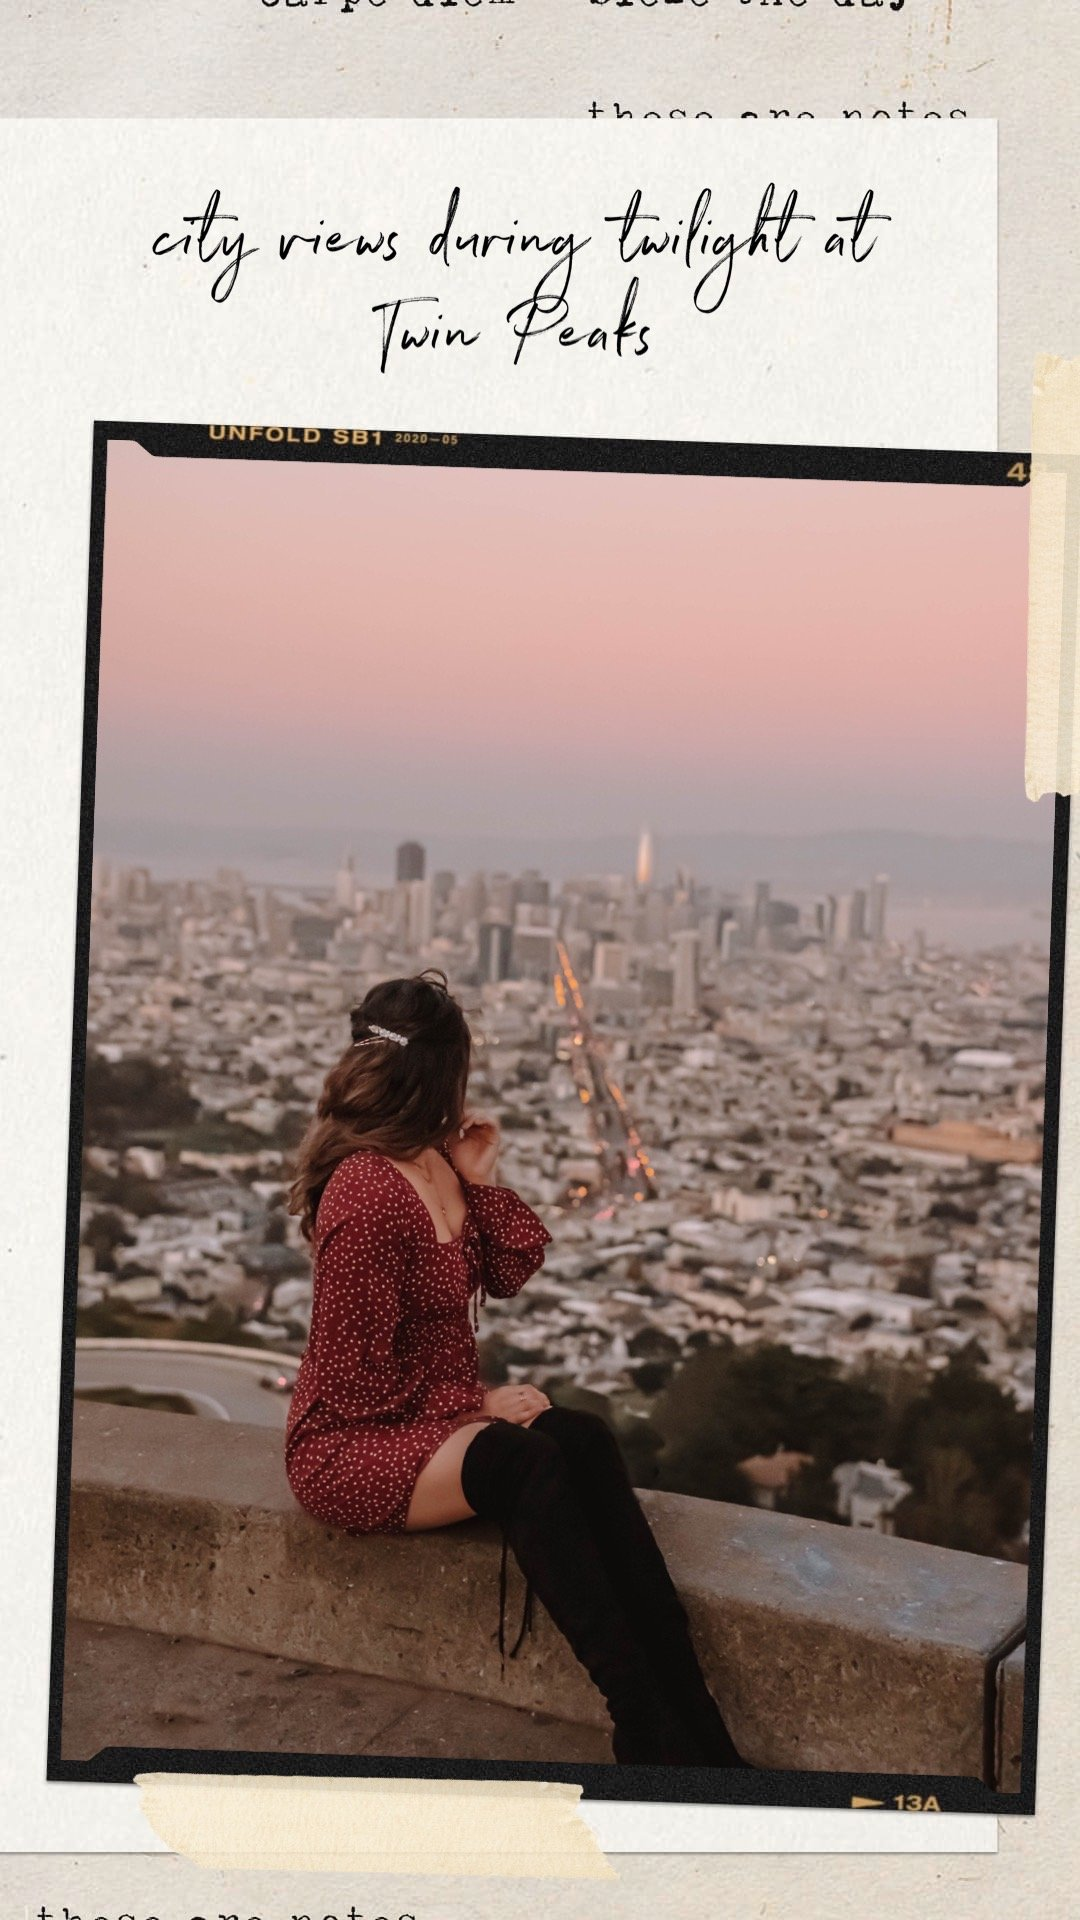 The Perfect 3-Day San Francisco Itinerary | the perfect 3-day itinerary for your next trip to San Francisco. Twin Peaks, San Francisco outfit, San Francisco photo idea, California travel